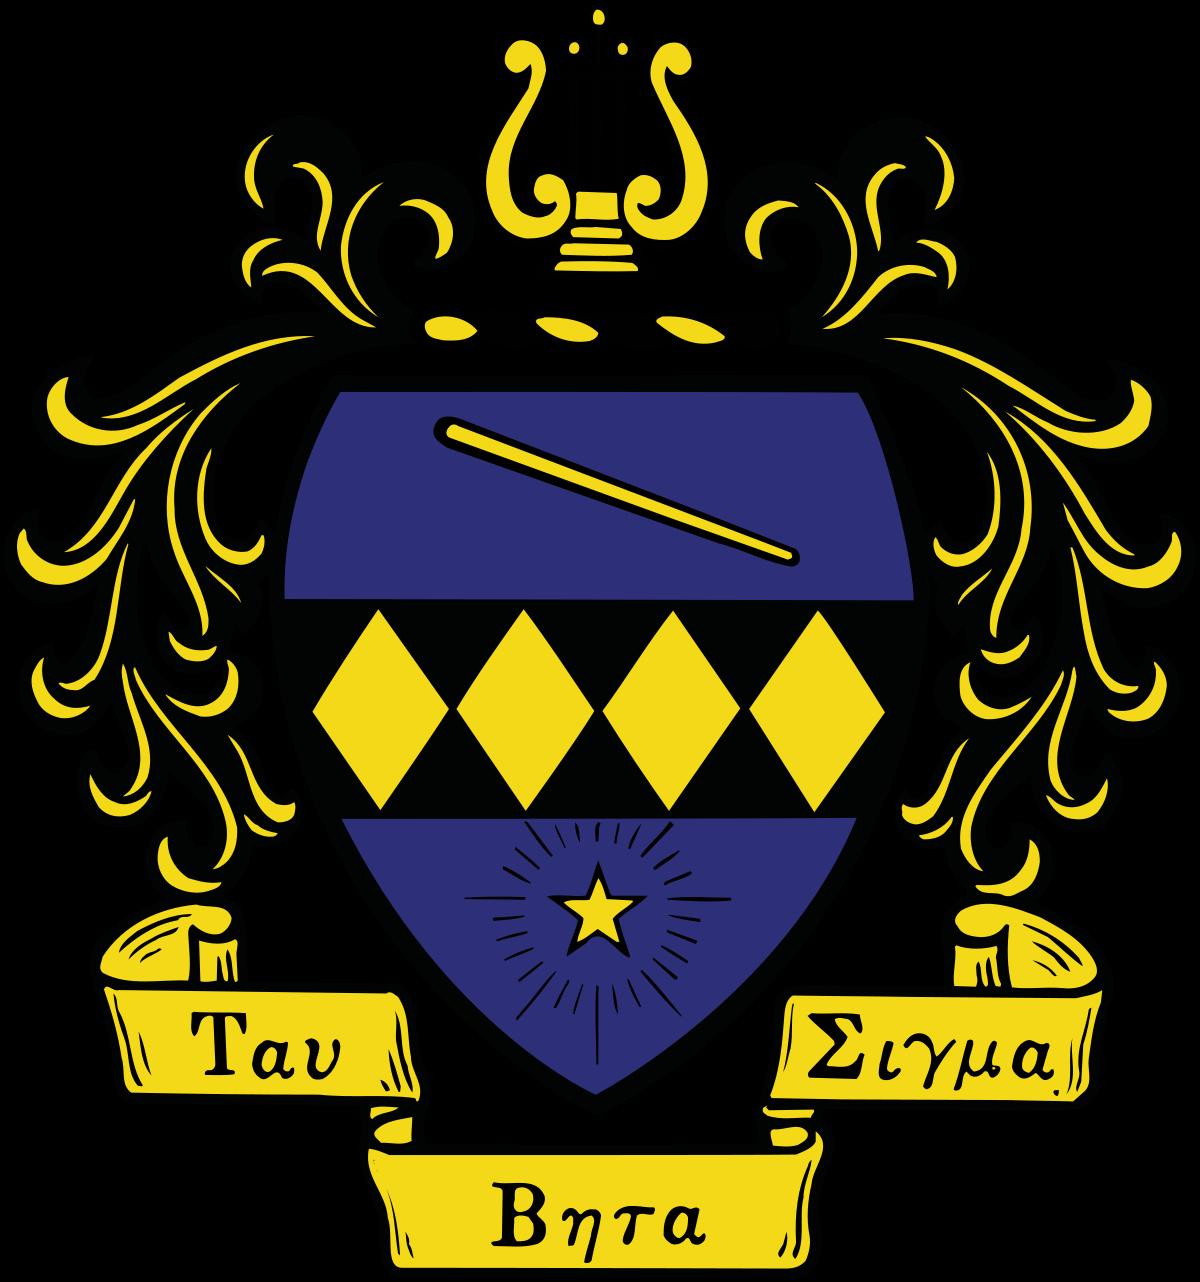 Tau Beta Sigma.